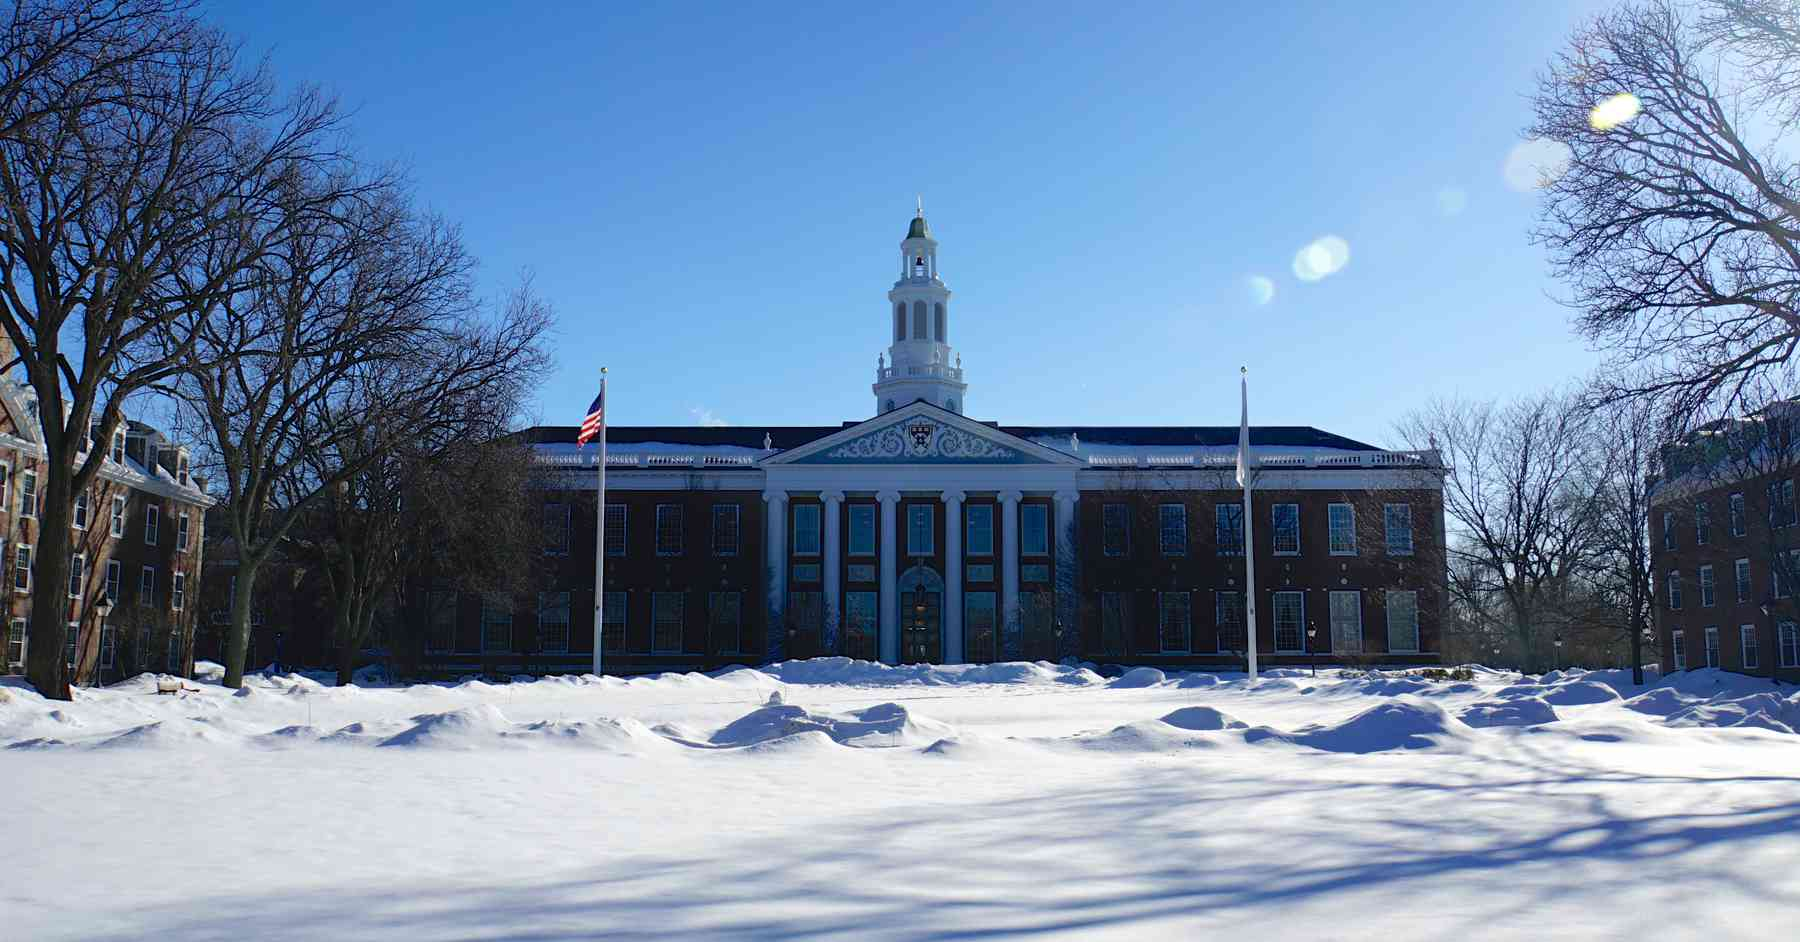 Harvard University - Niche